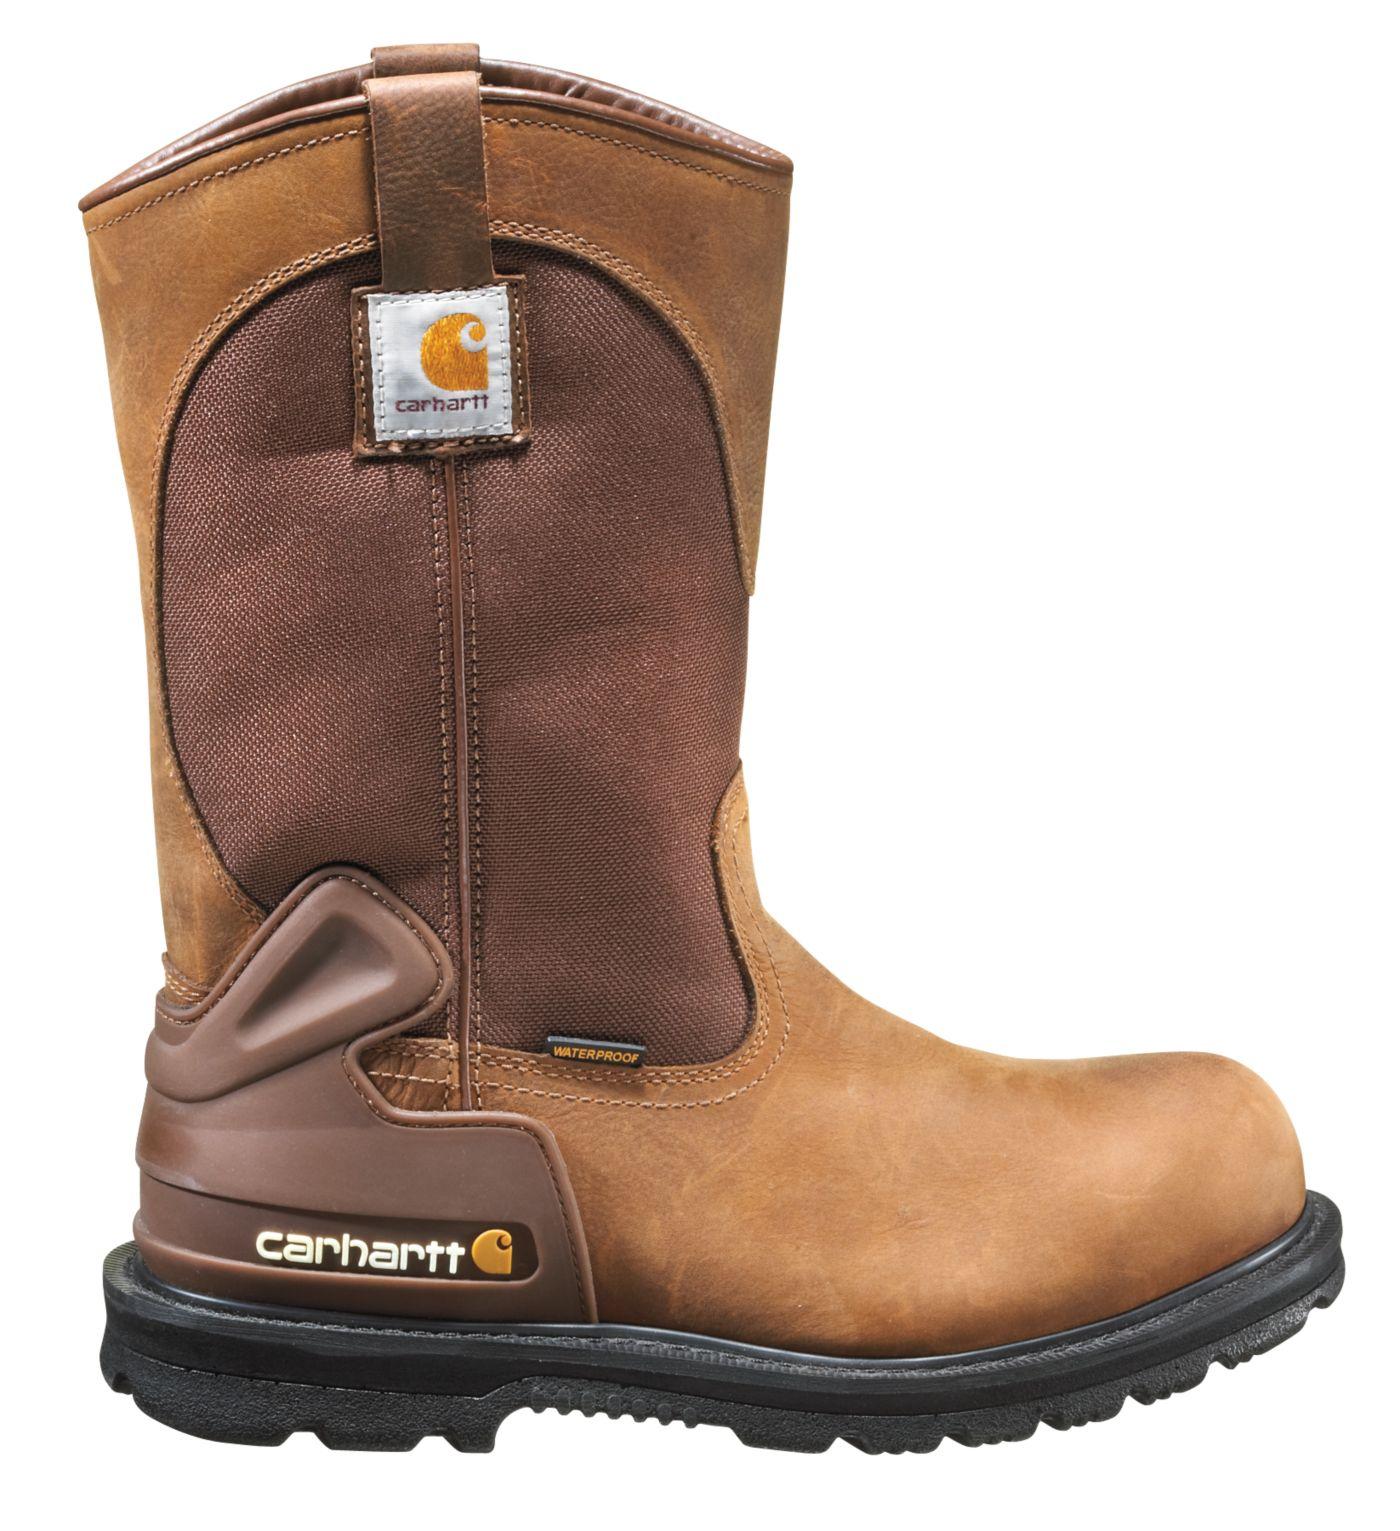 "Carhartt Men's 11"" Wellington Steel Toe Waterproof Work Boots"